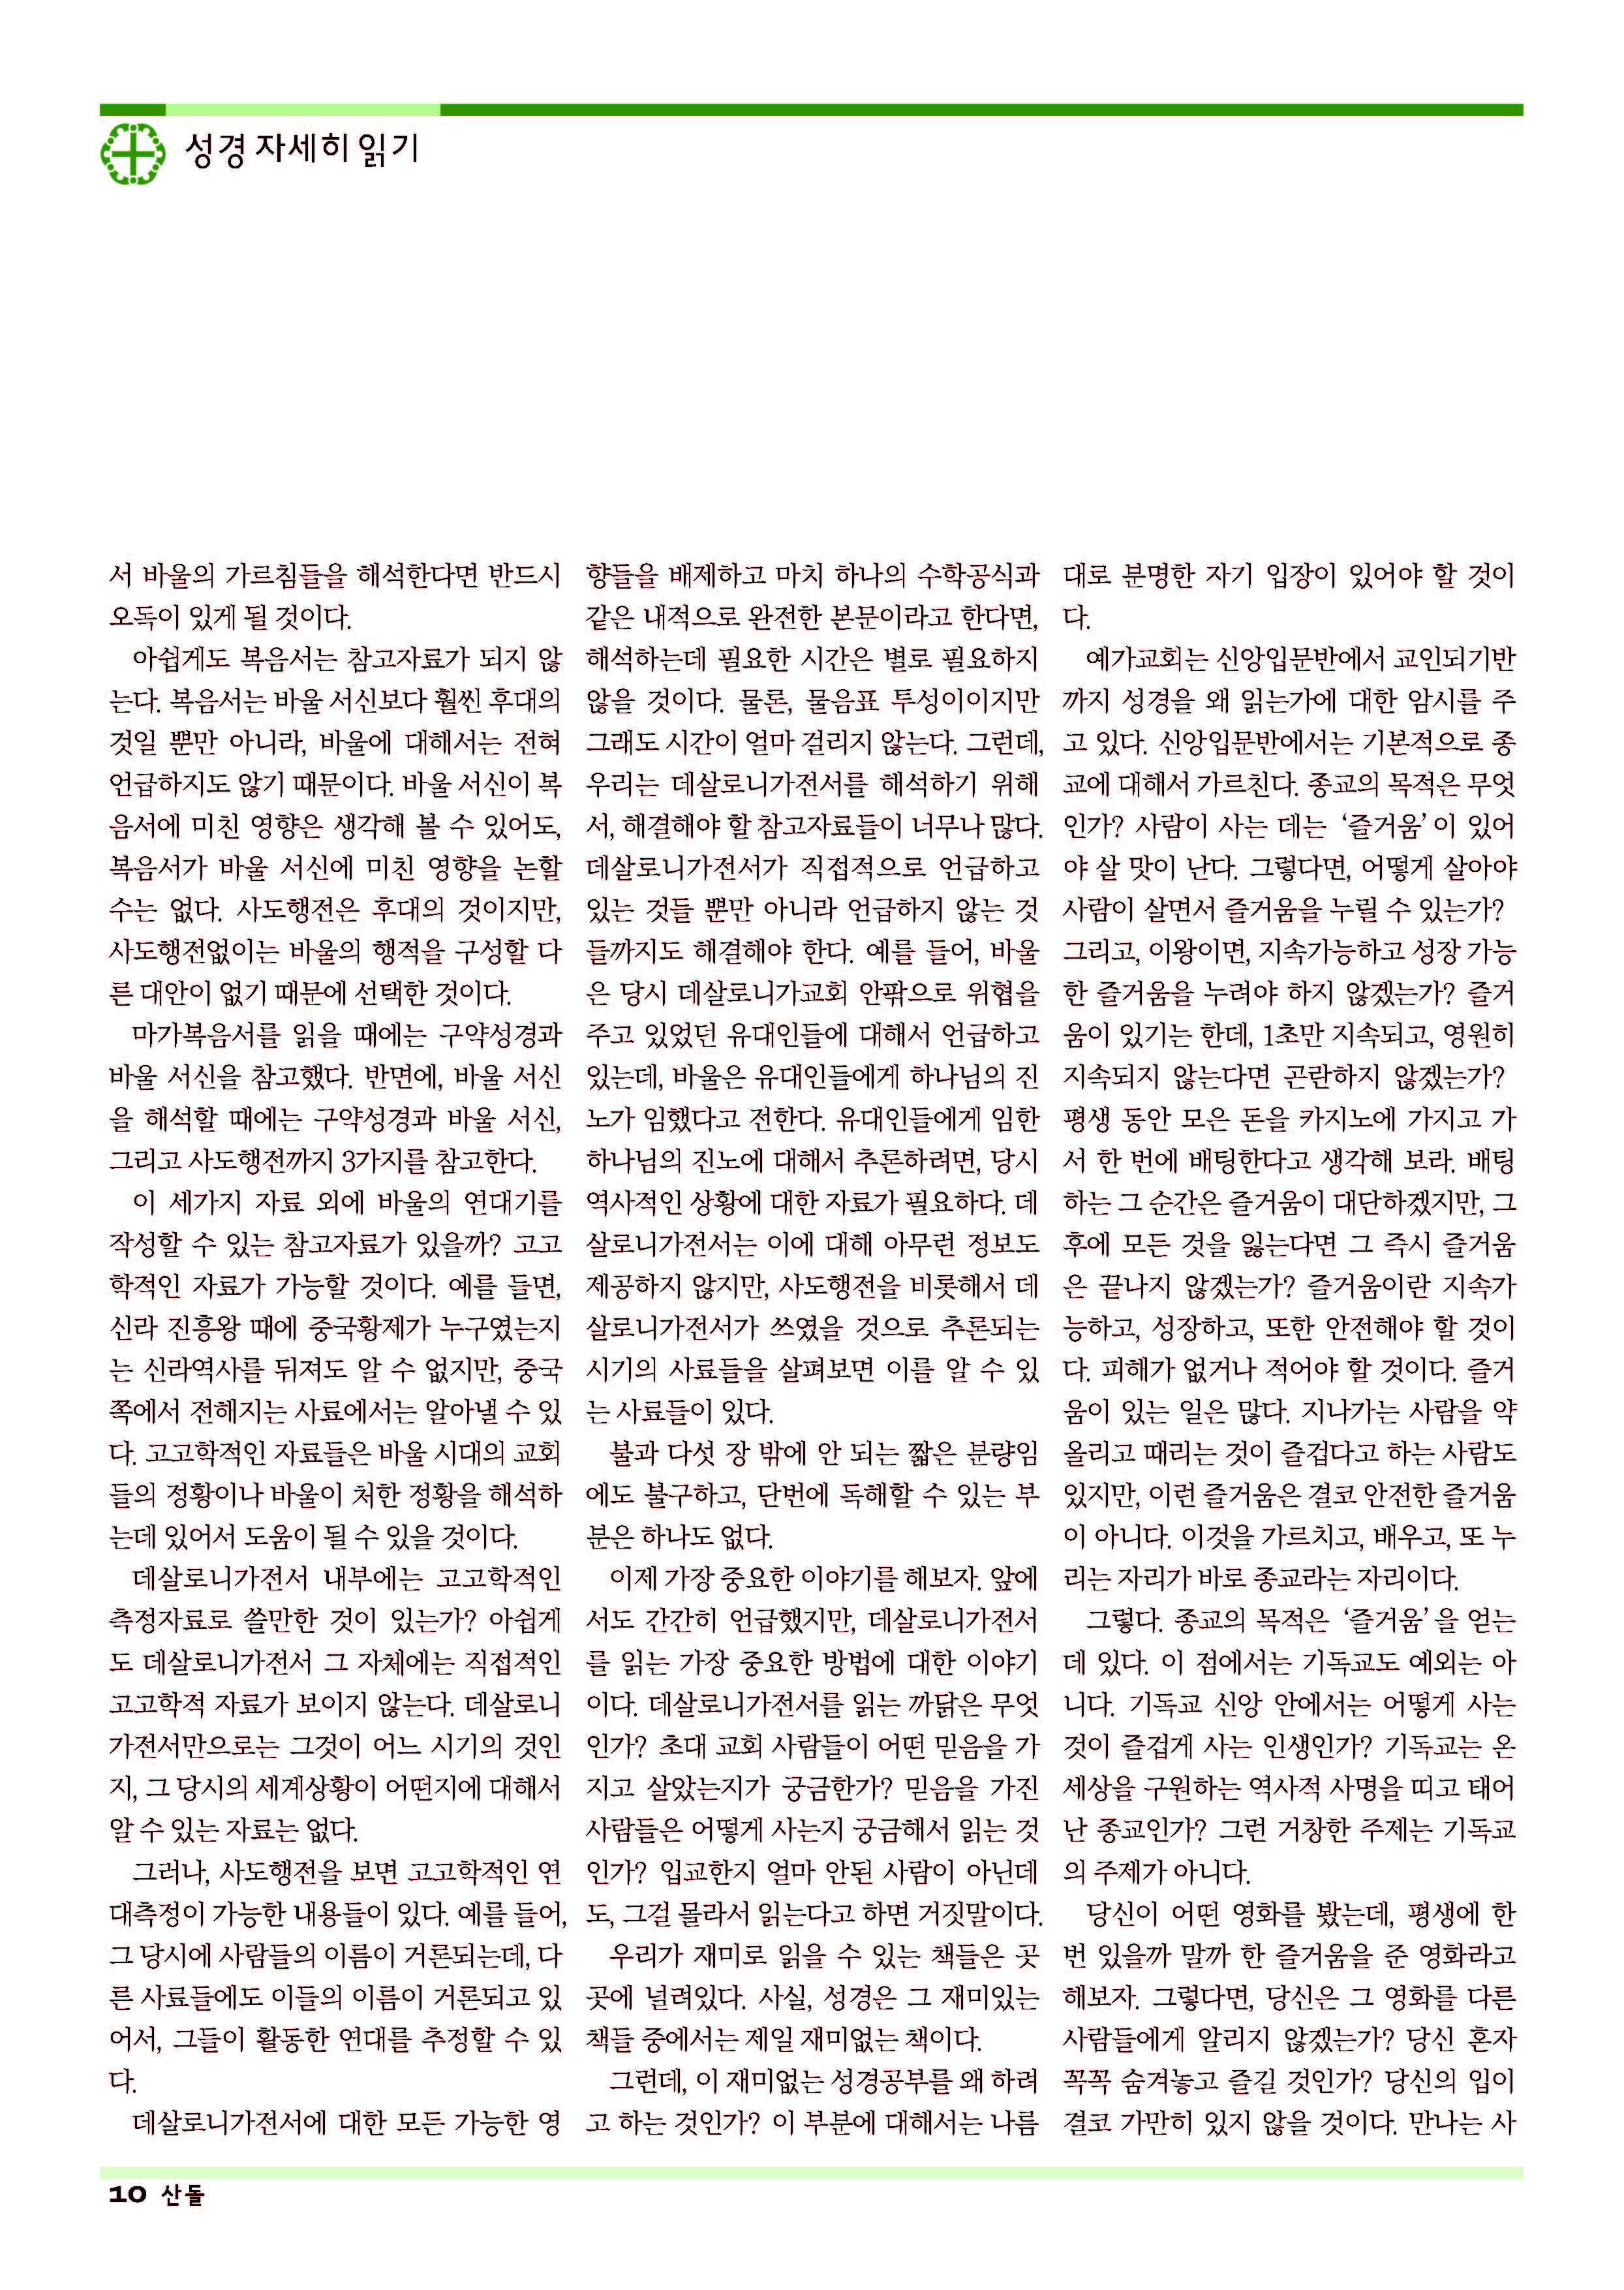 14sdjb0112_페이지_10.jpg